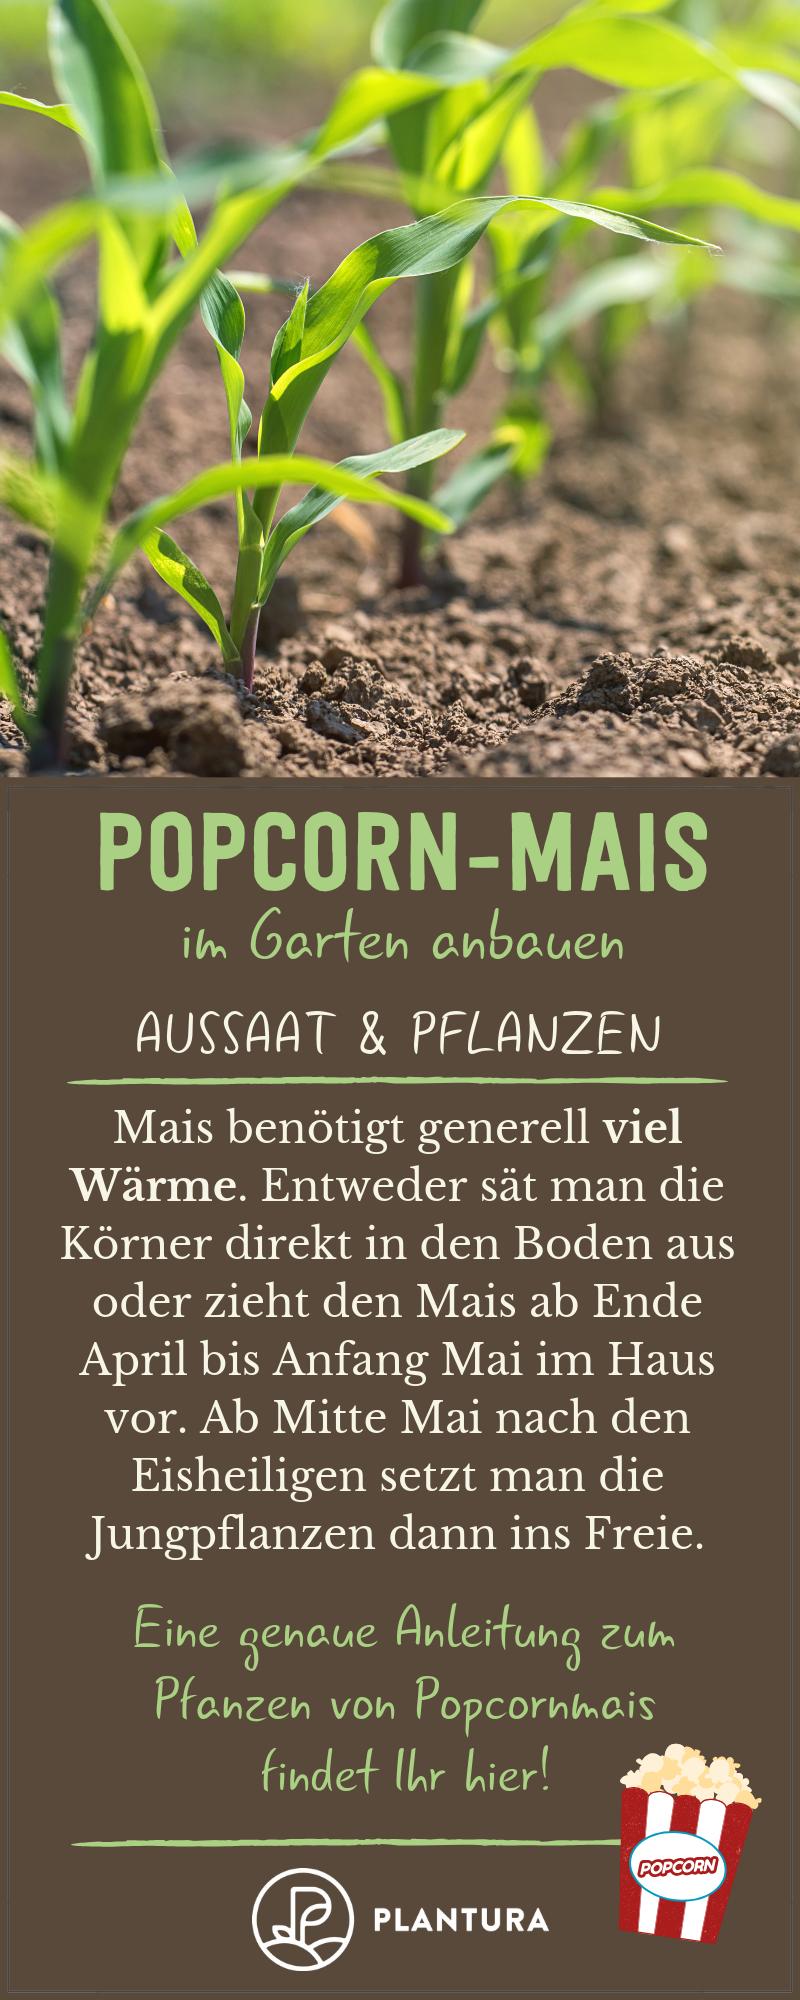 Popcorn Selber Anbauen Anleitung Expertentipps Plantura Popcorn Mais Pflanzen Mais Pflanzen